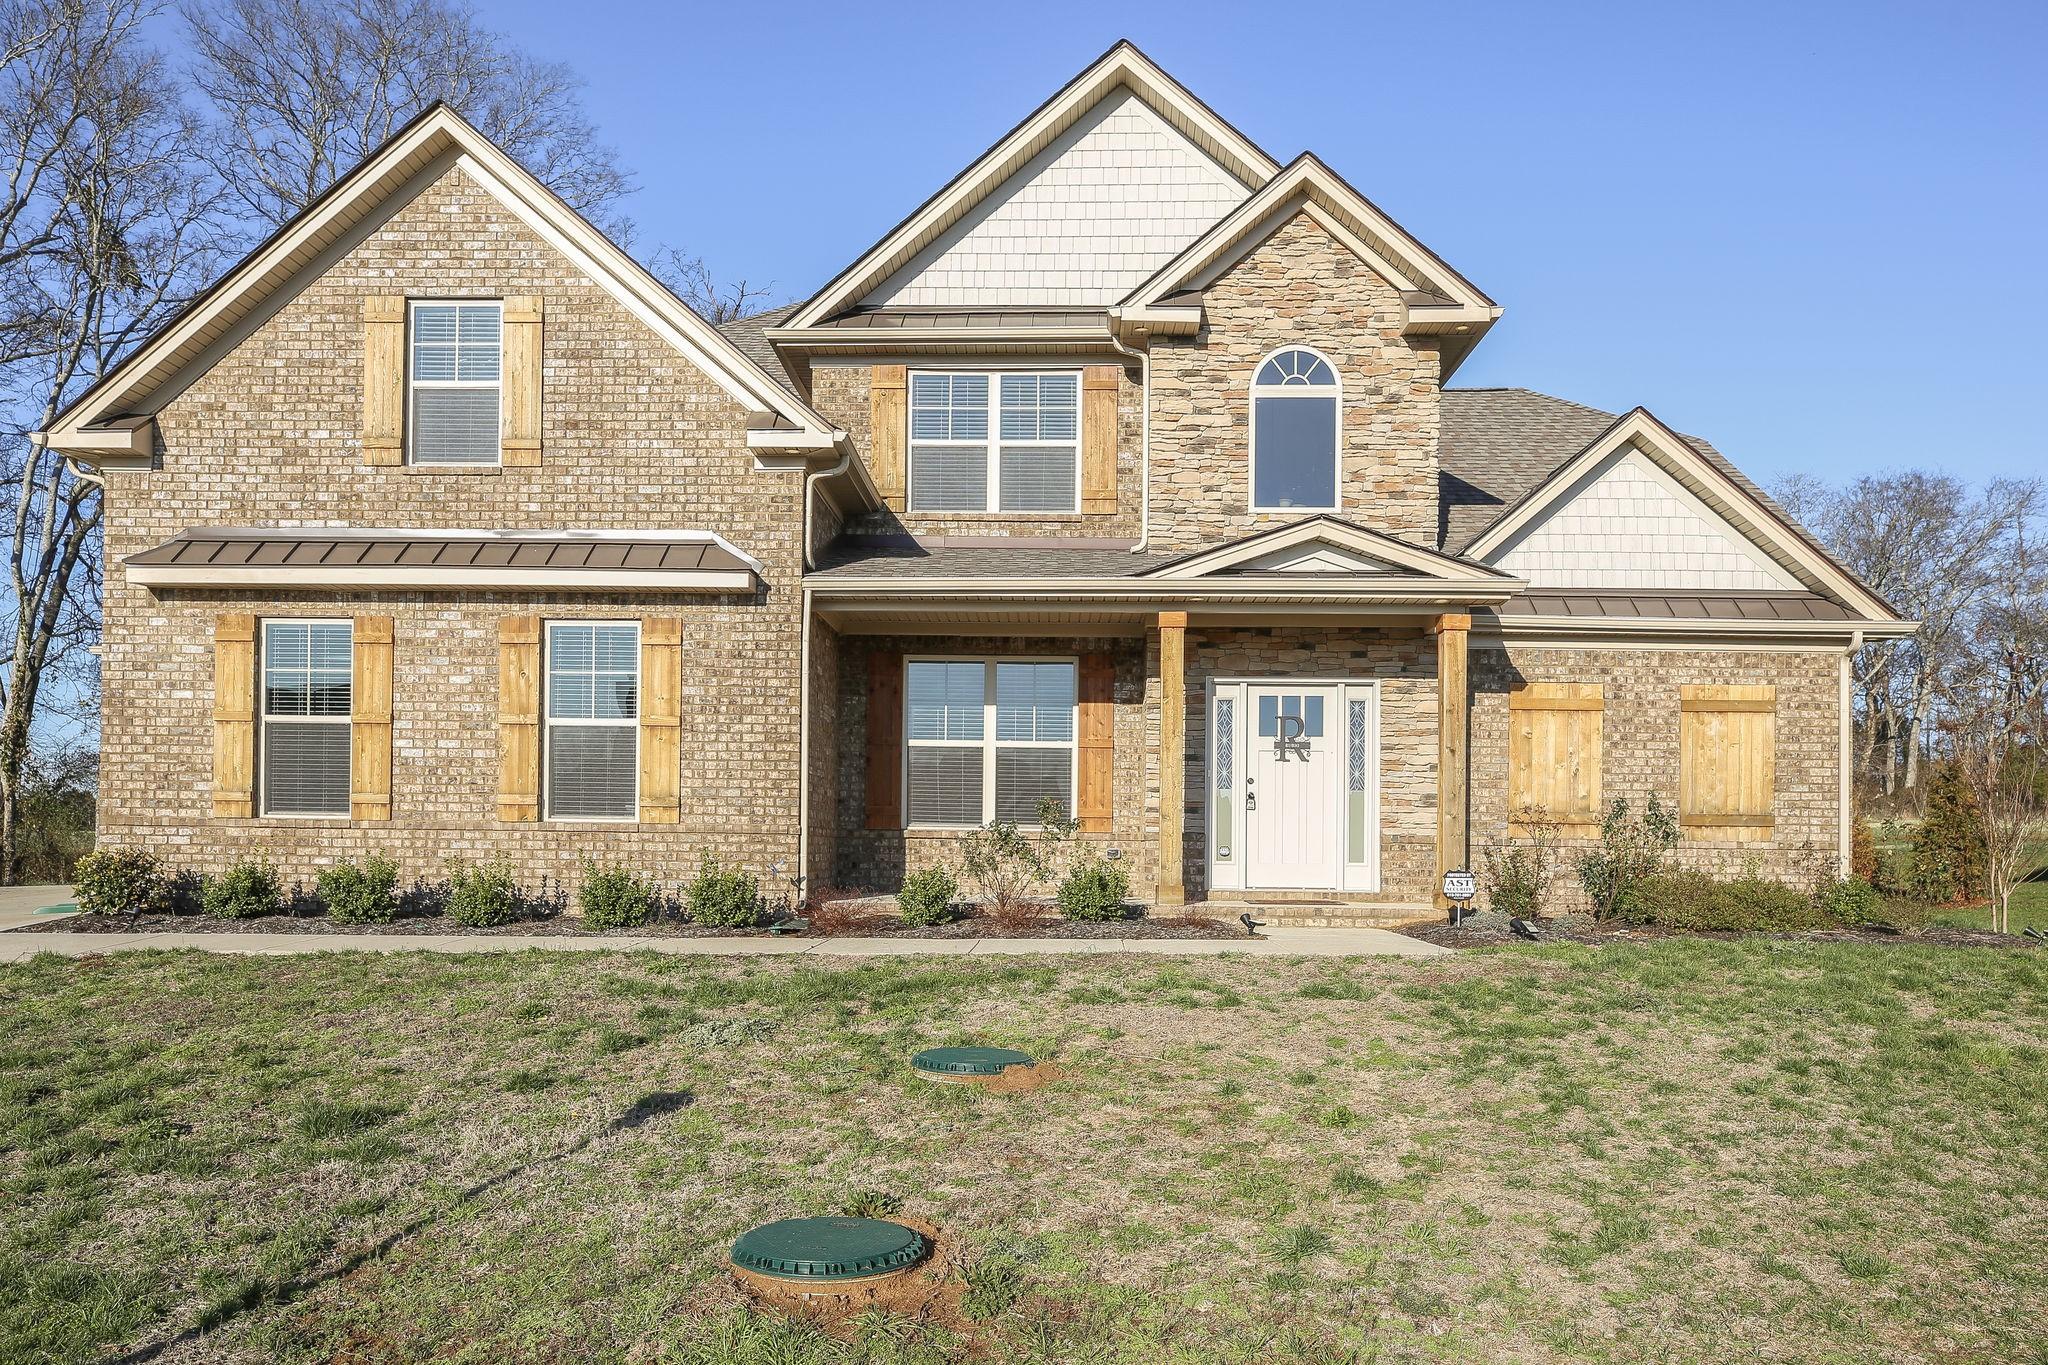 1000 Kittywood Ct, Murfreesboro, TN 37129 - Murfreesboro, TN real estate listing